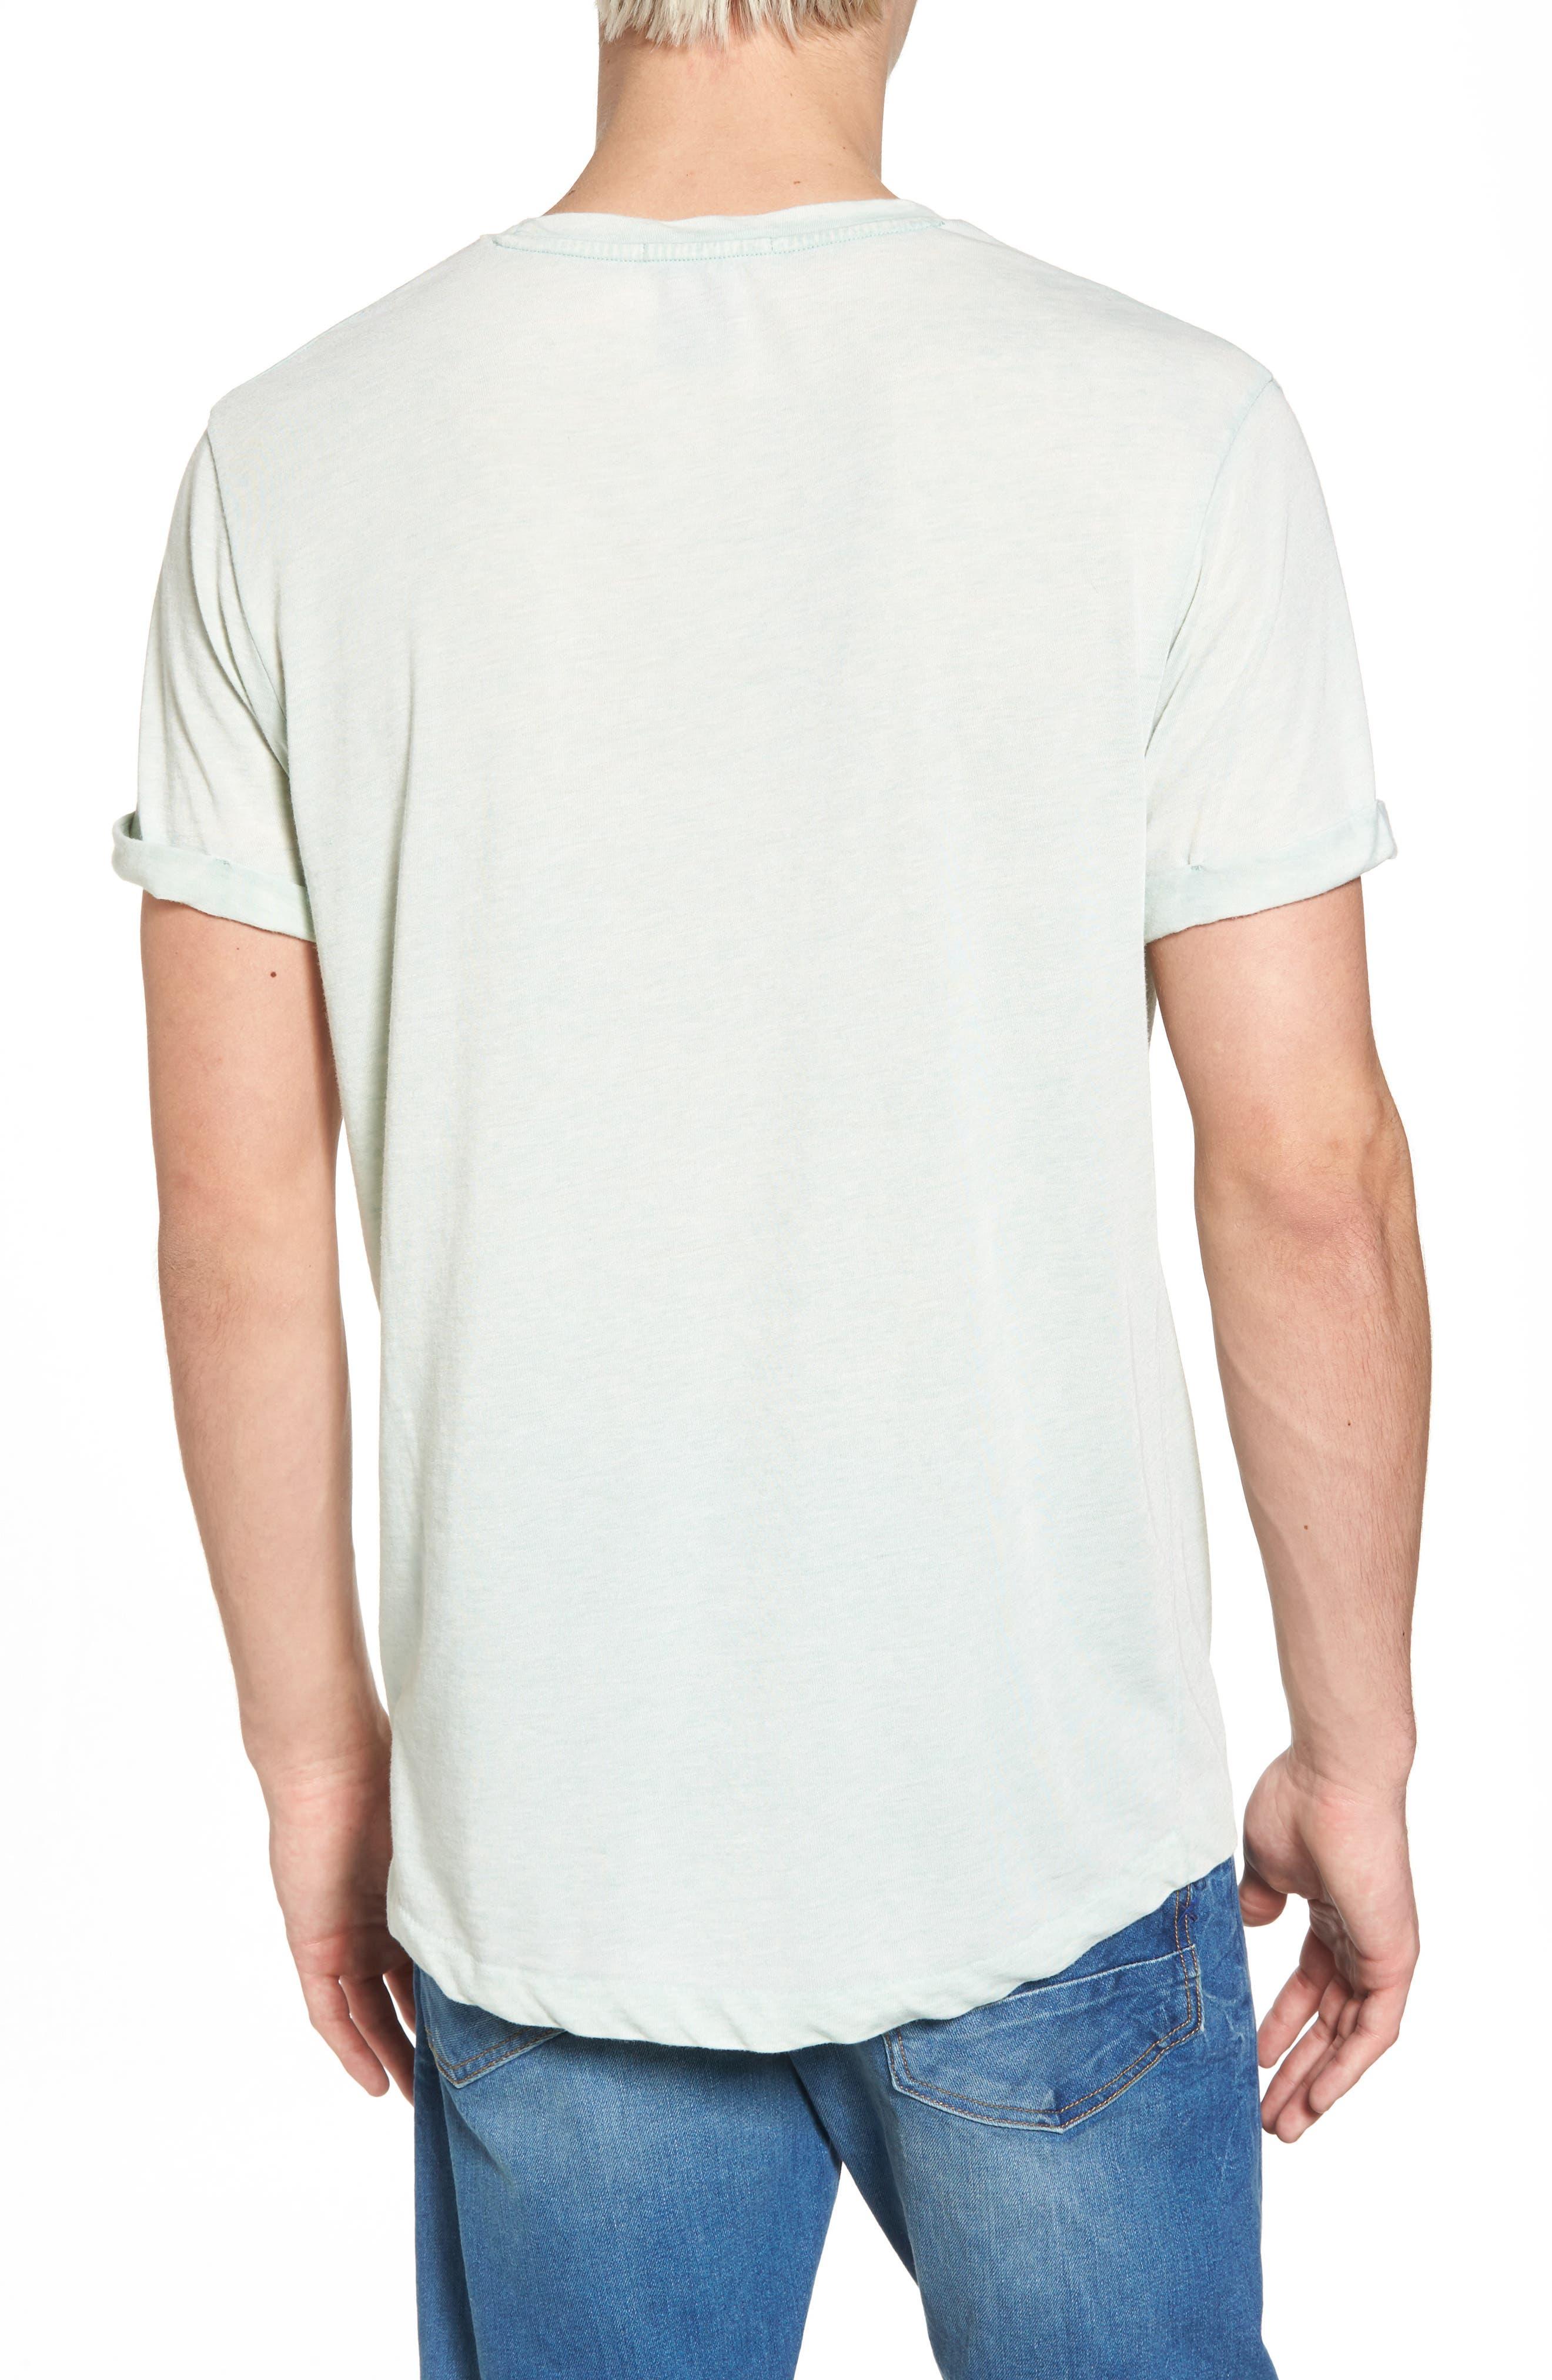 Ausbrenner T-Shirt,                             Alternate thumbnail 2, color,                             Seafoam Green Melange